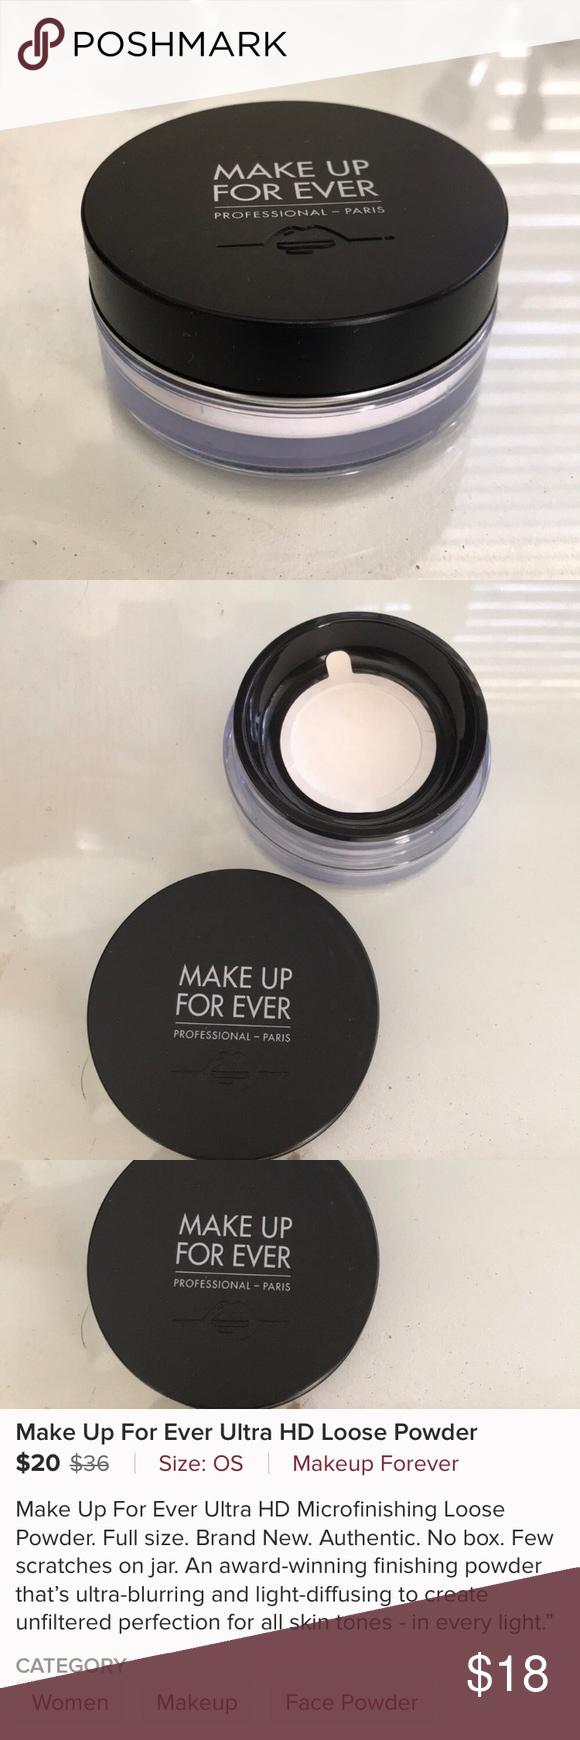 Makeup Forever Hd Powder Makeup Forever Makeup Forever Hd Makeup